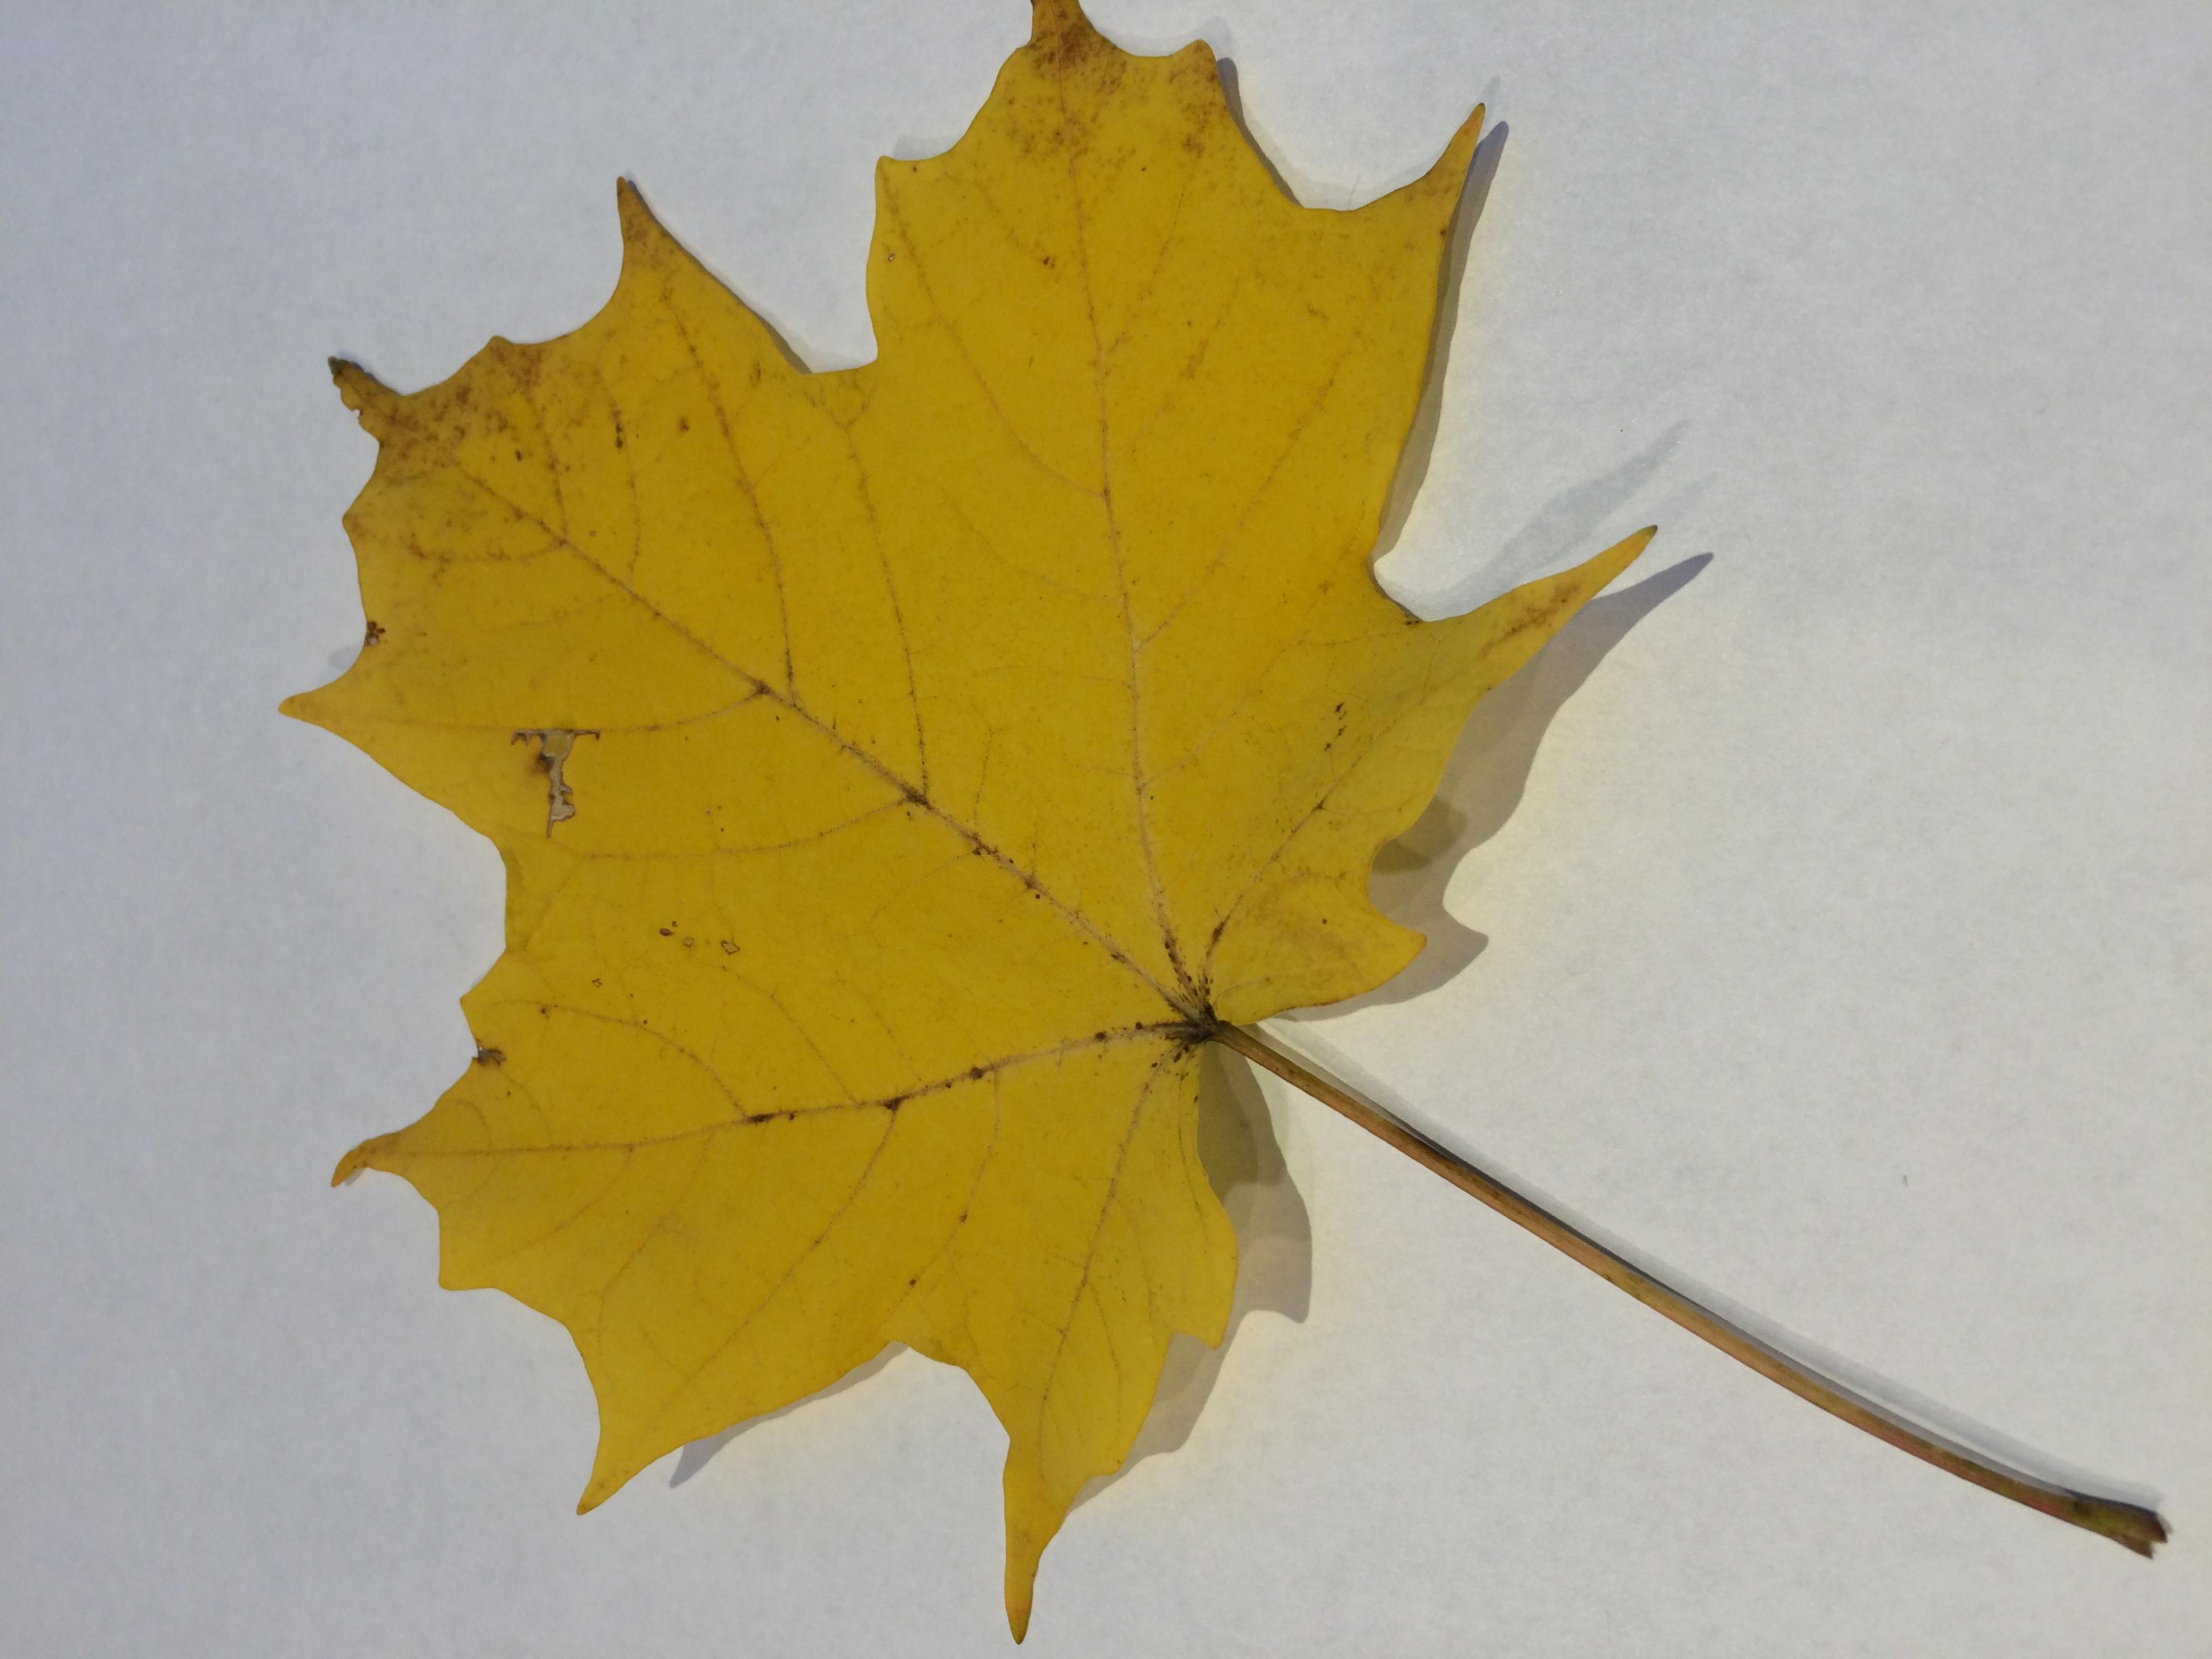 gwl/static/gwl/images/new-leaves/yellow-2.jpg